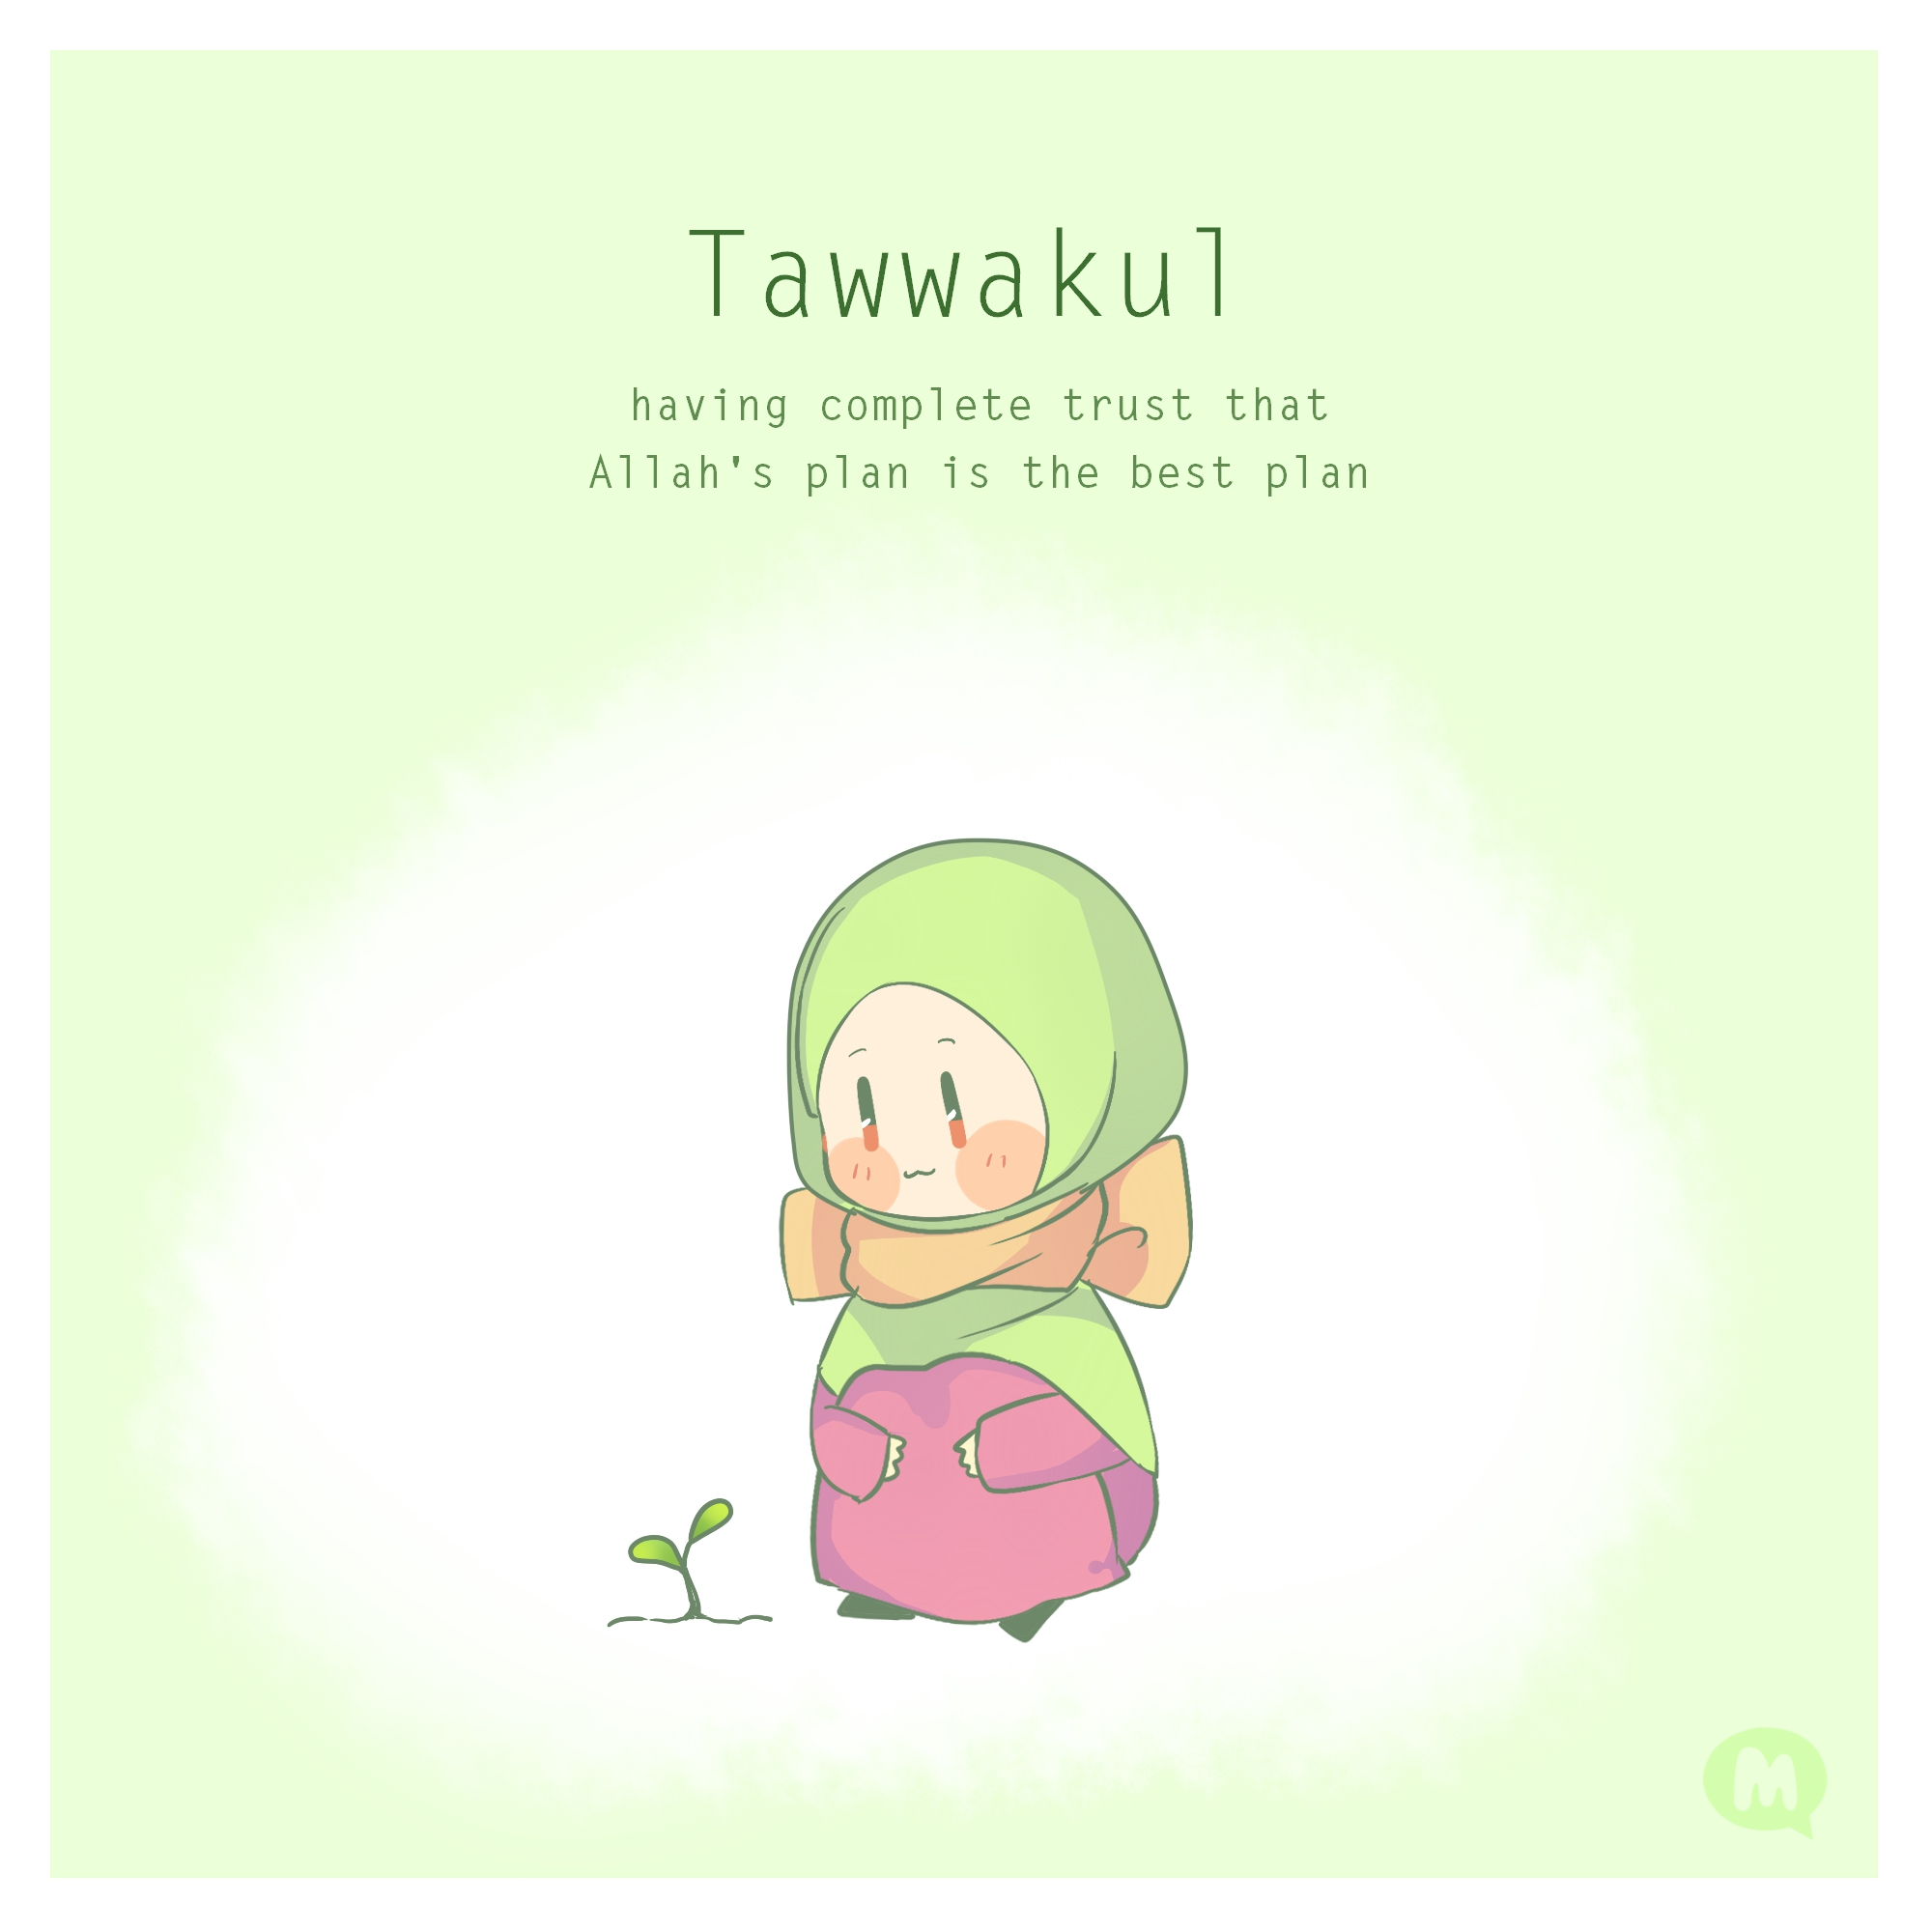 tawwakul